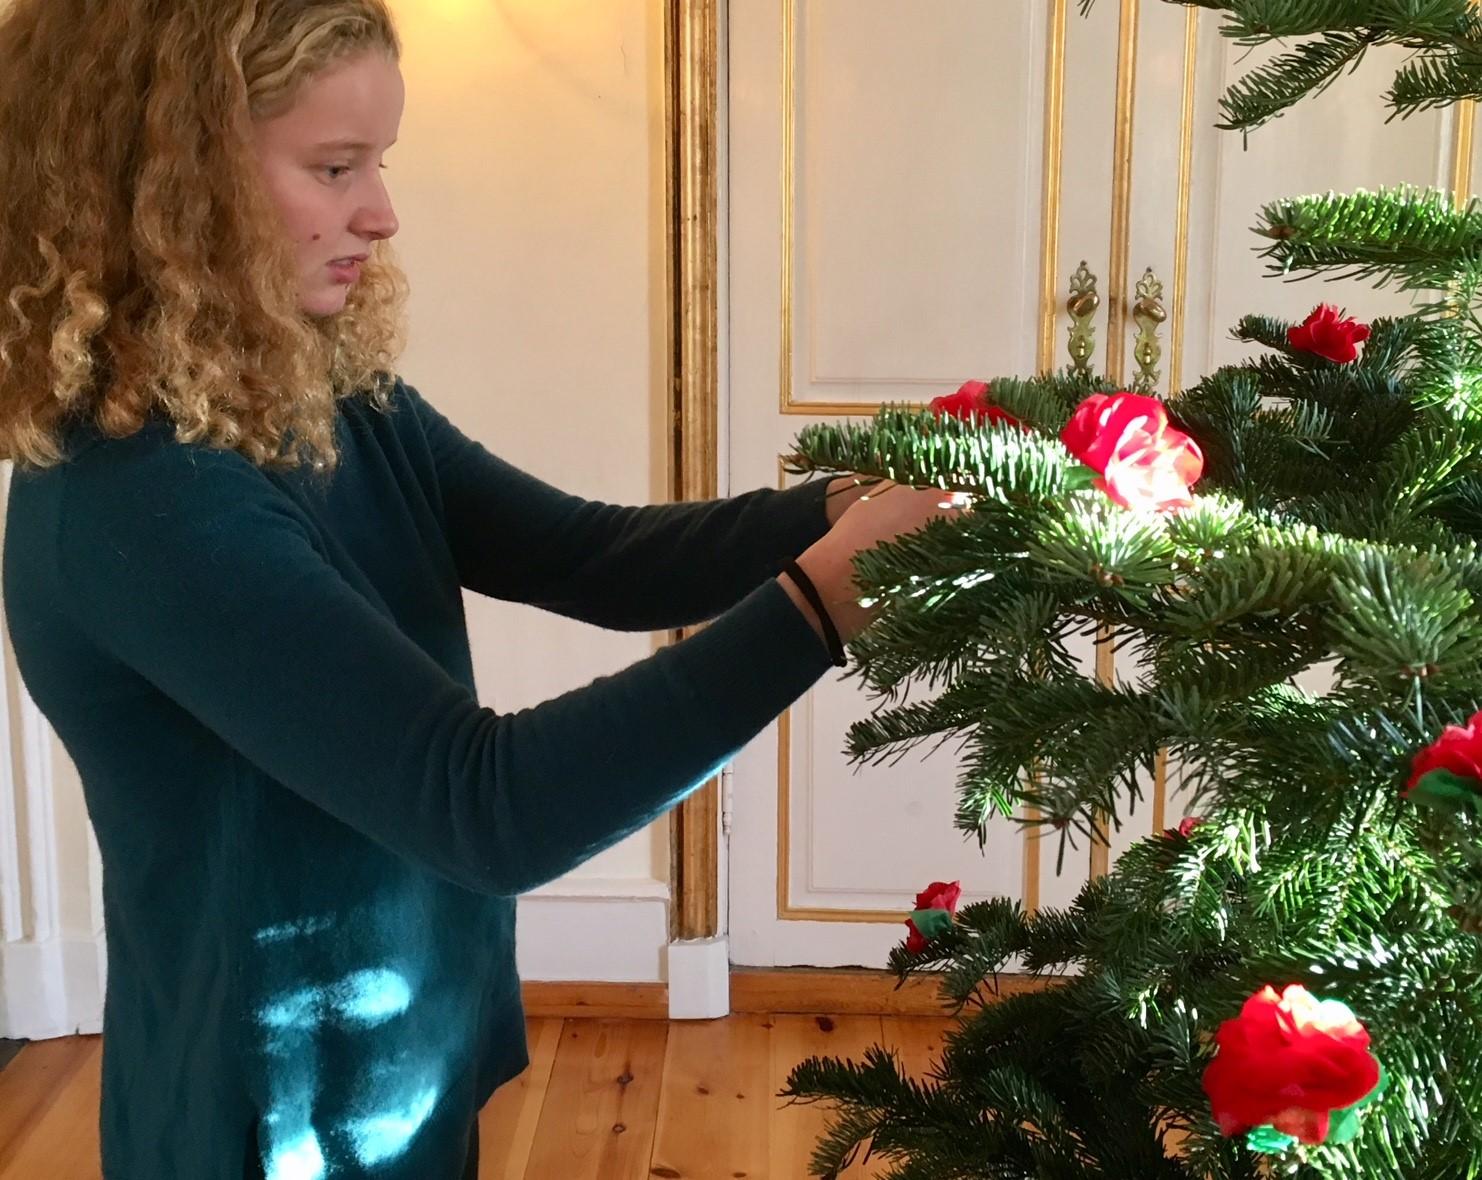 Juletreet i Konventionssalen ble pyntet med vakre juleroser i silkepapir. Foto: Bjørg Holsvik / Moss by- og industrimuseum.